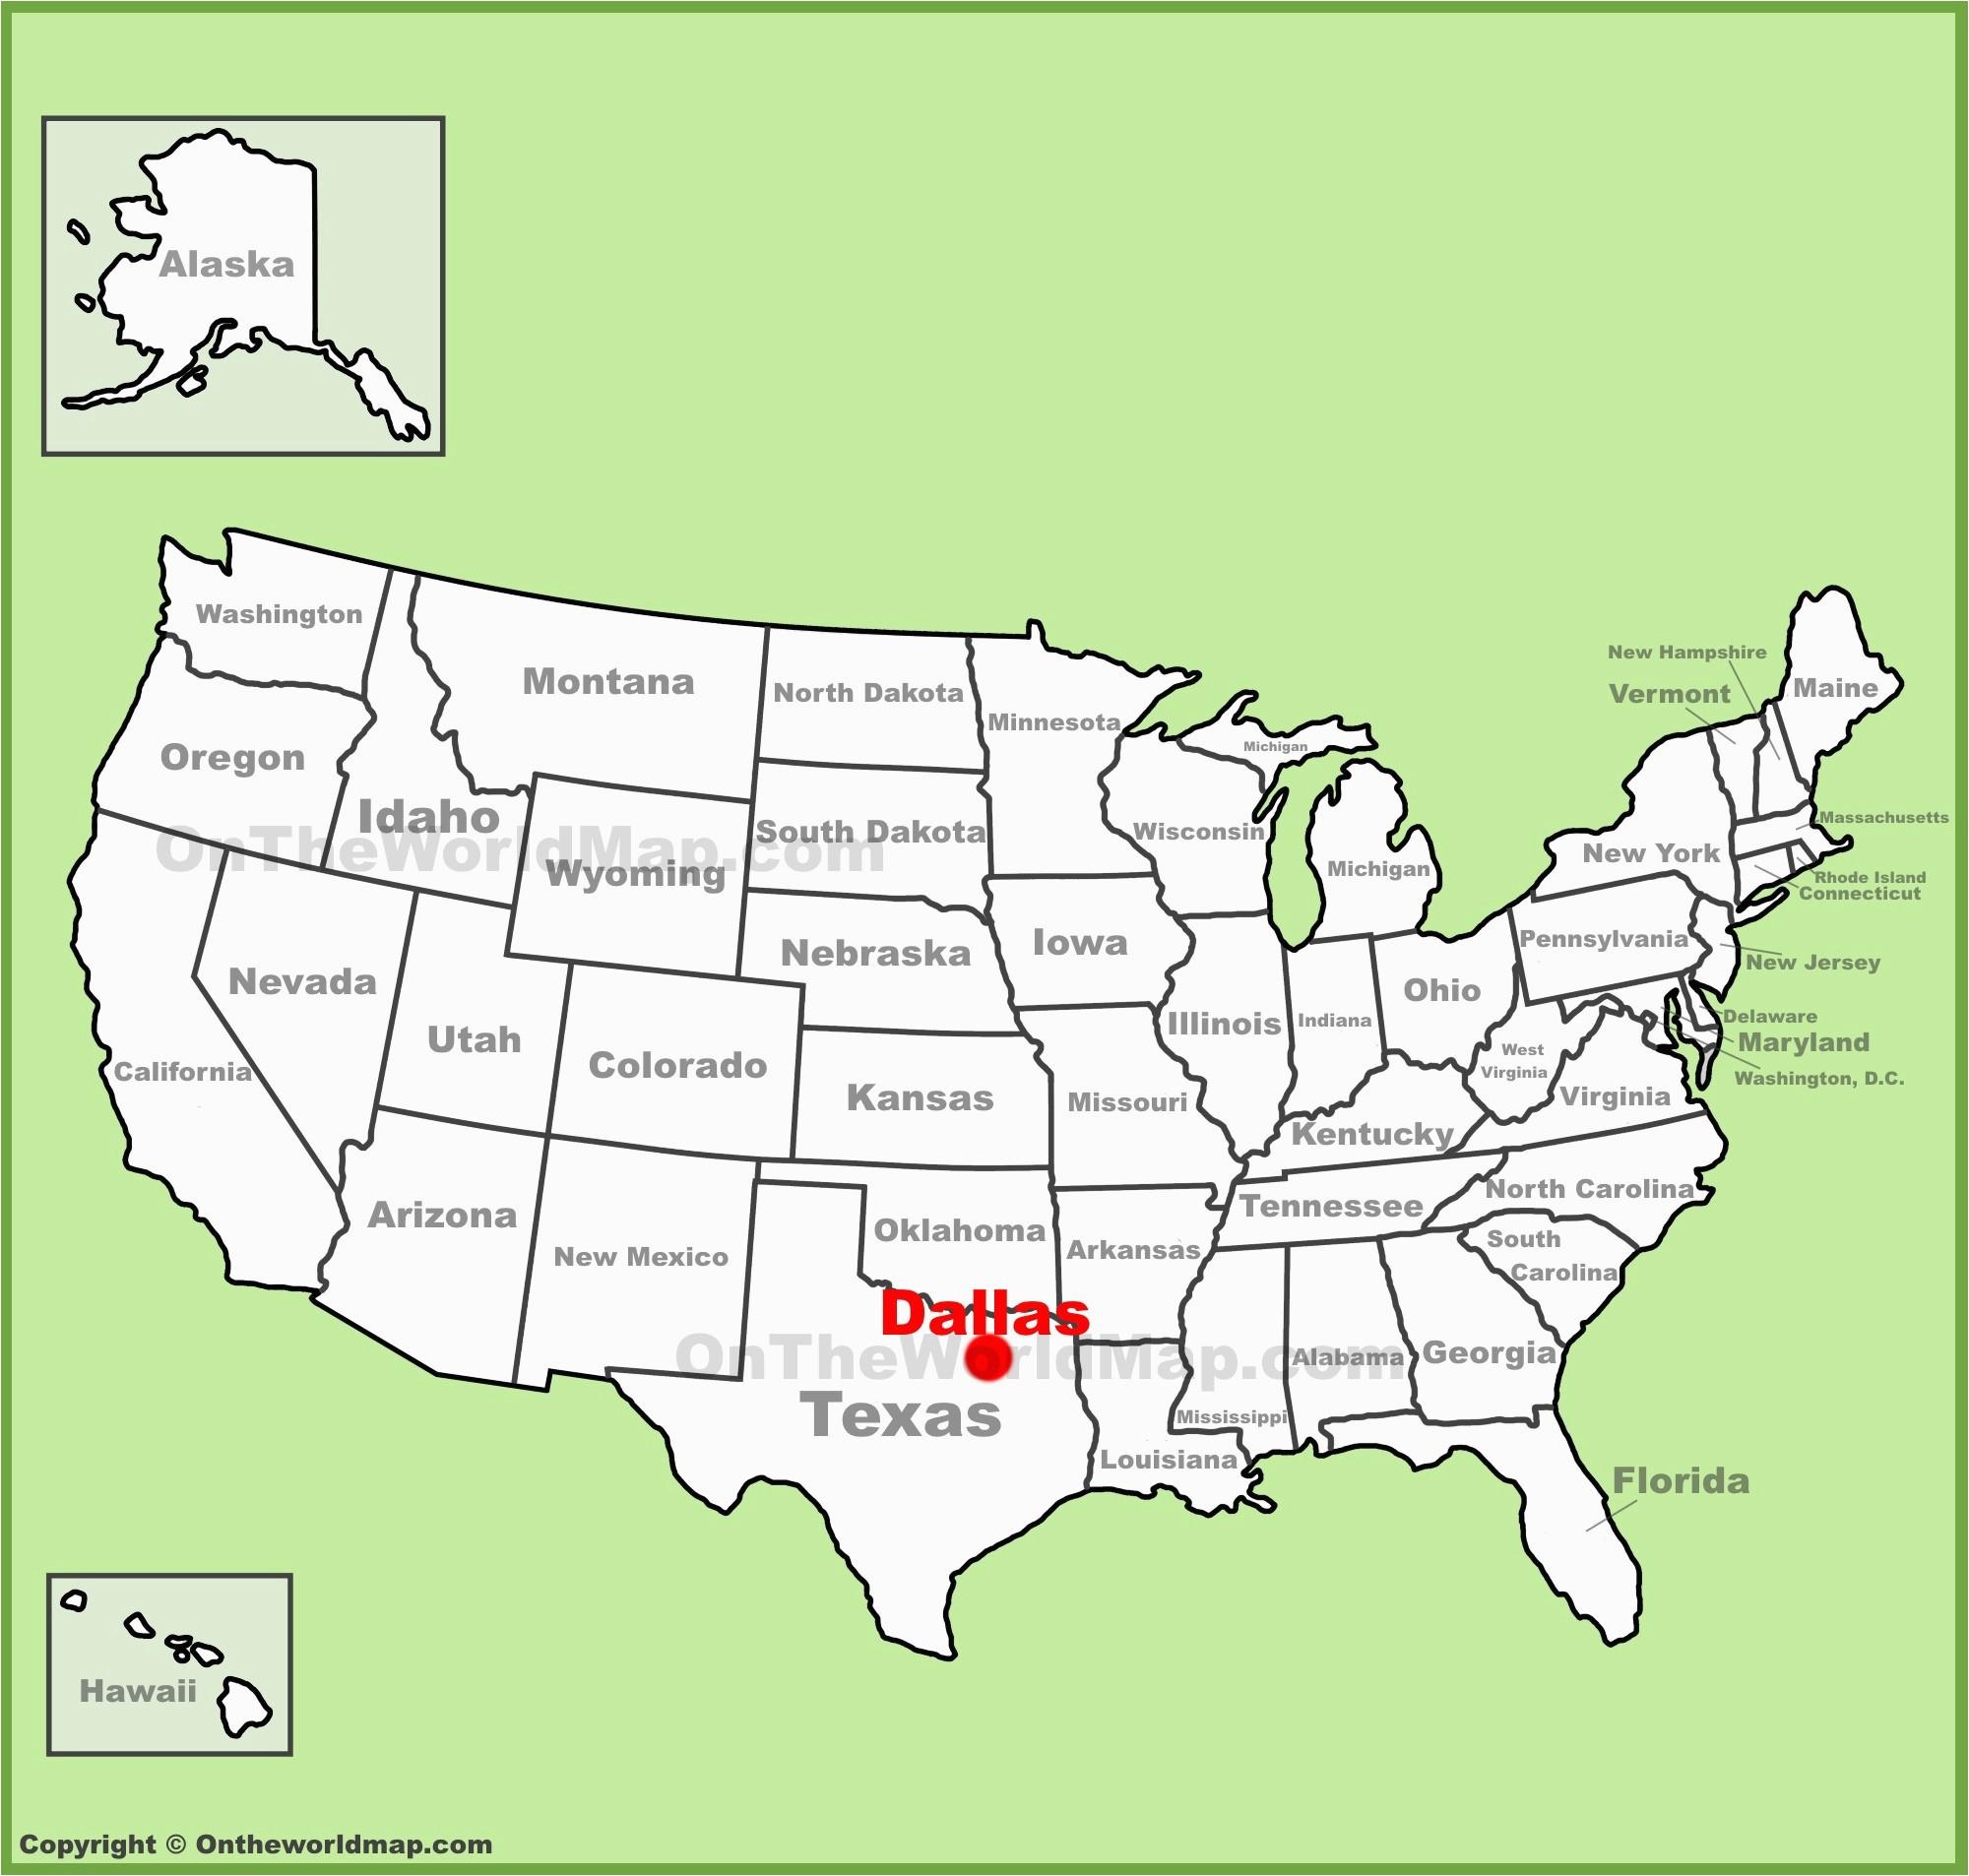 Map Of Texas Dallas Area.Dallas Oregon Map Us Map Dallas Tx New Richmond Texas Map Elegant